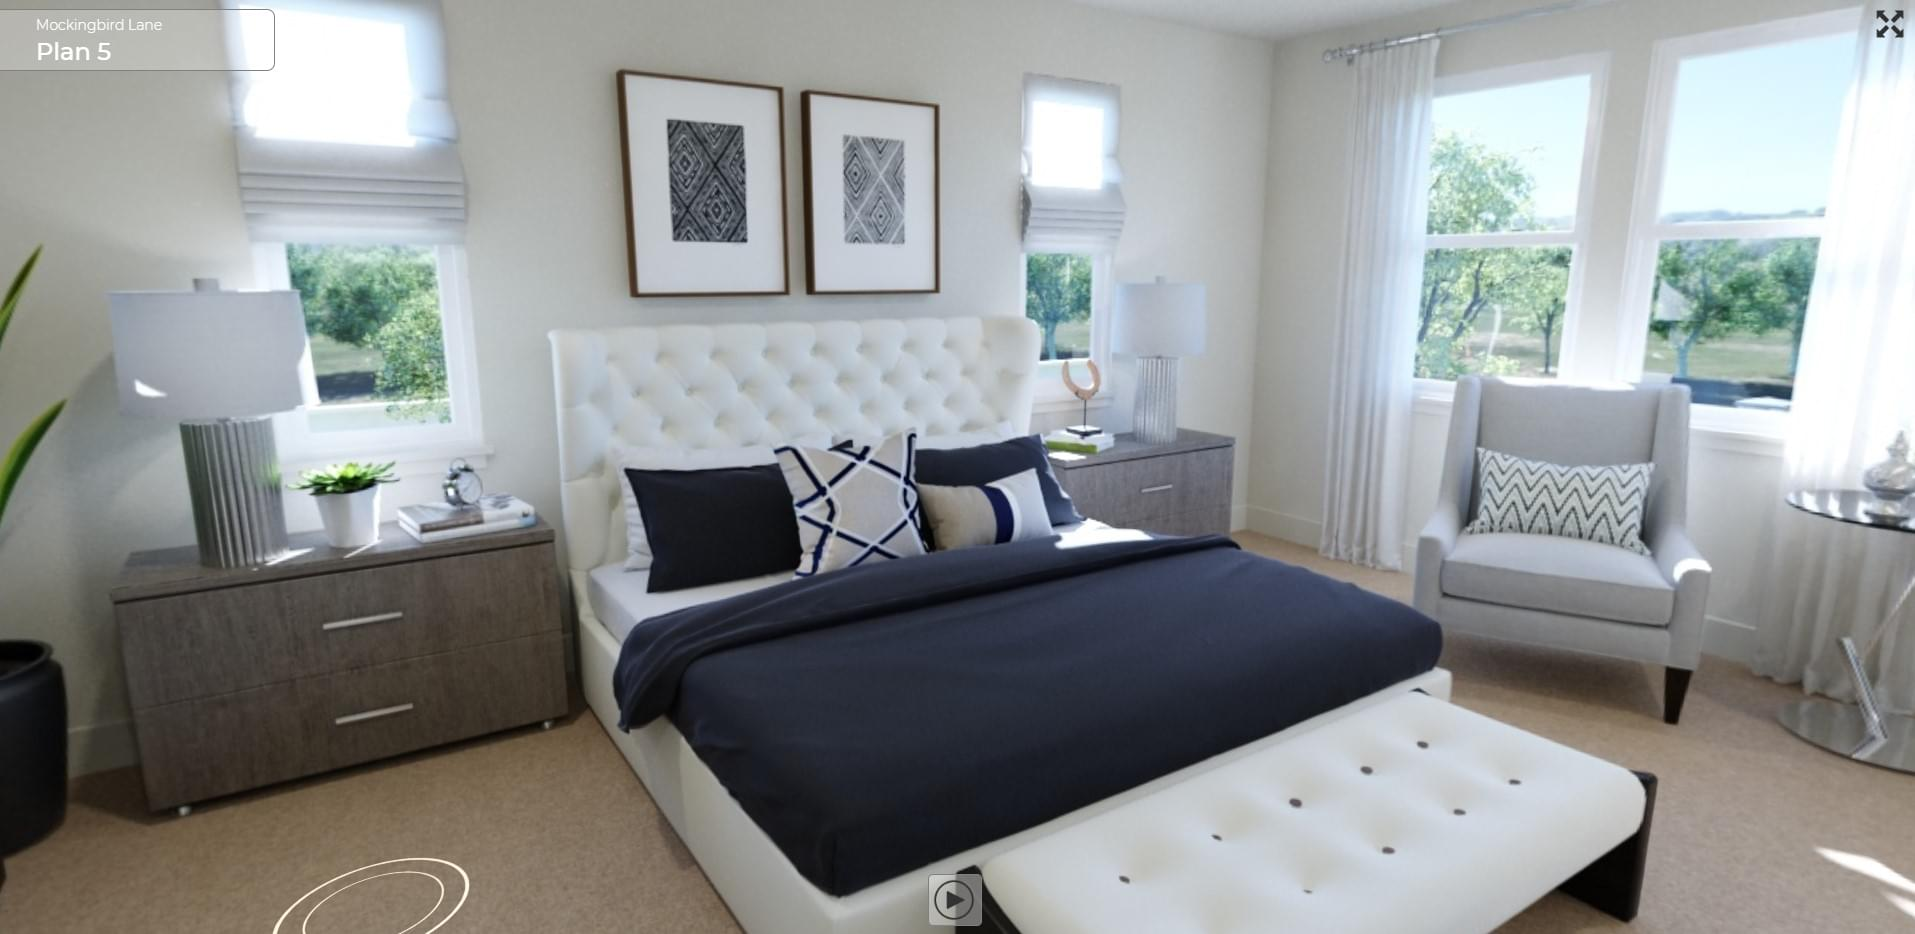 Residence 5 Master Bedroom